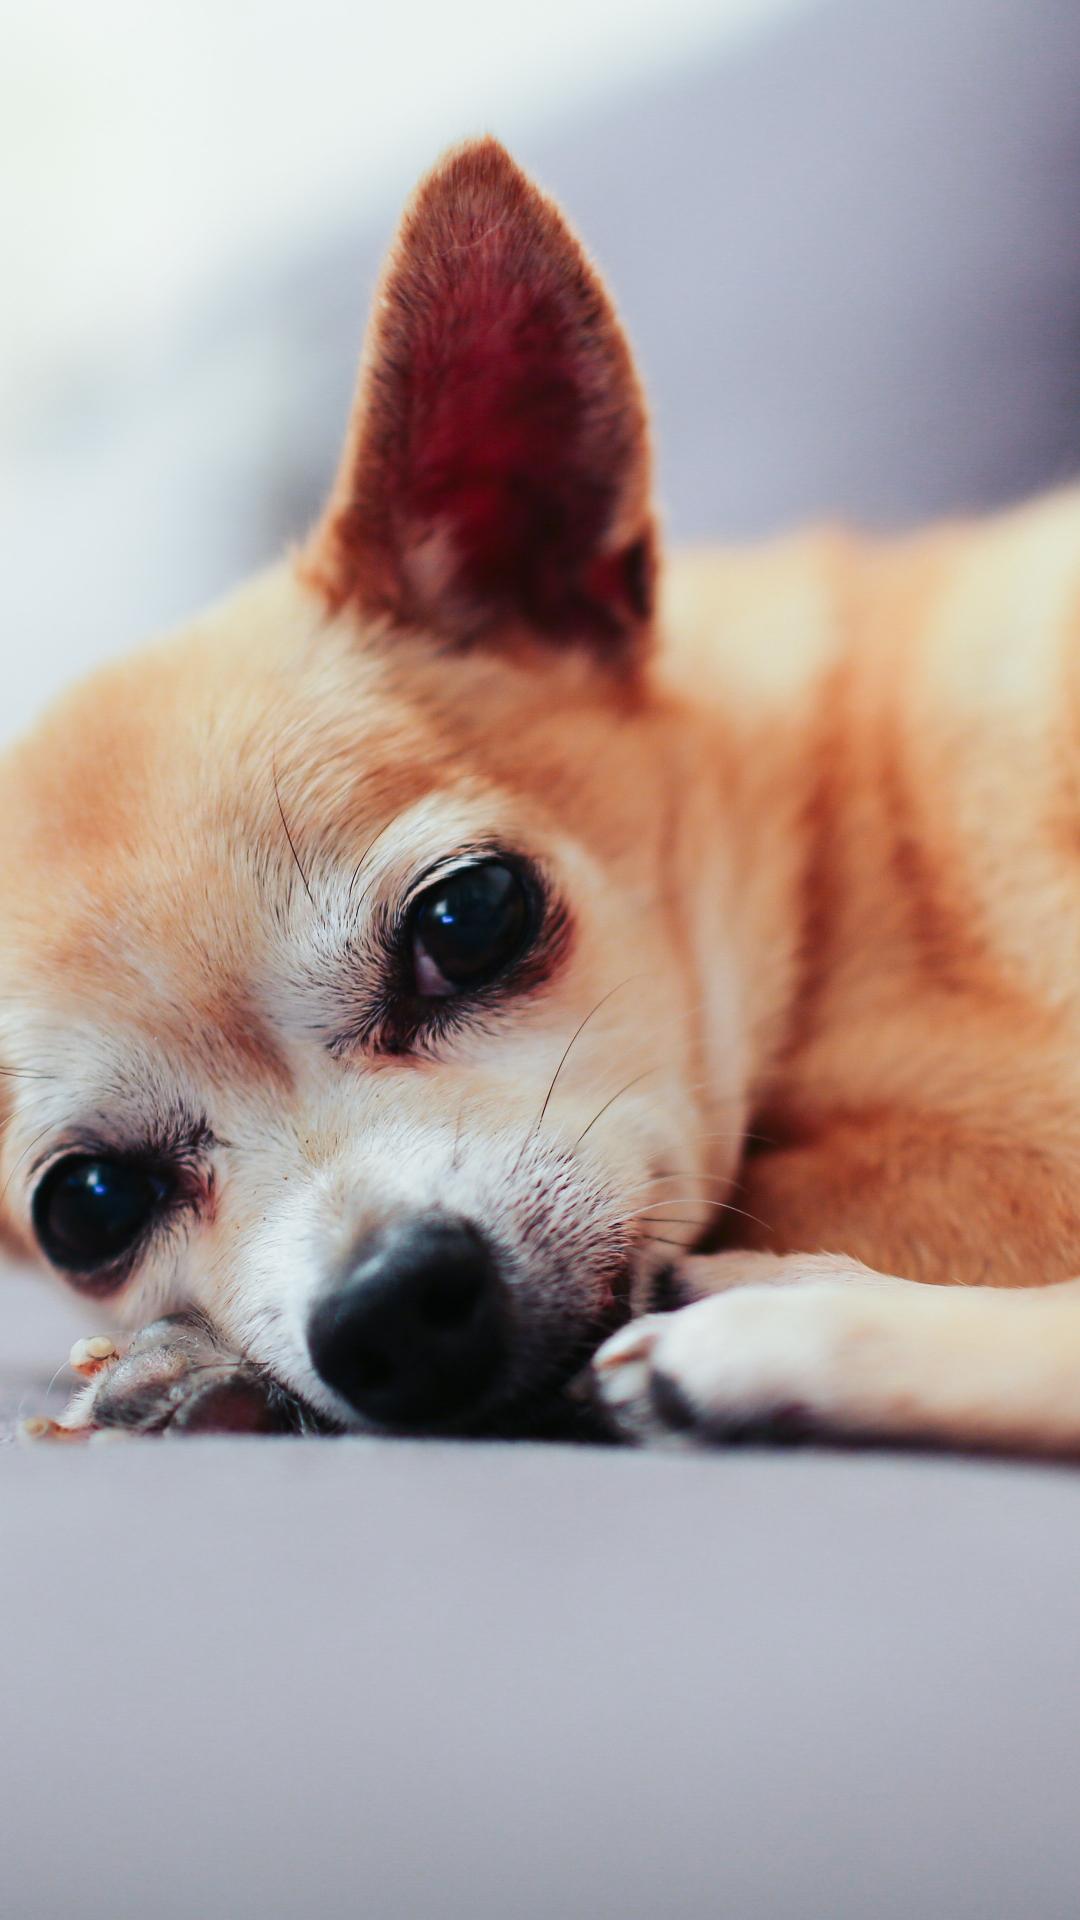 animal dog chihuahua puppy iphone wallpaper idrop news